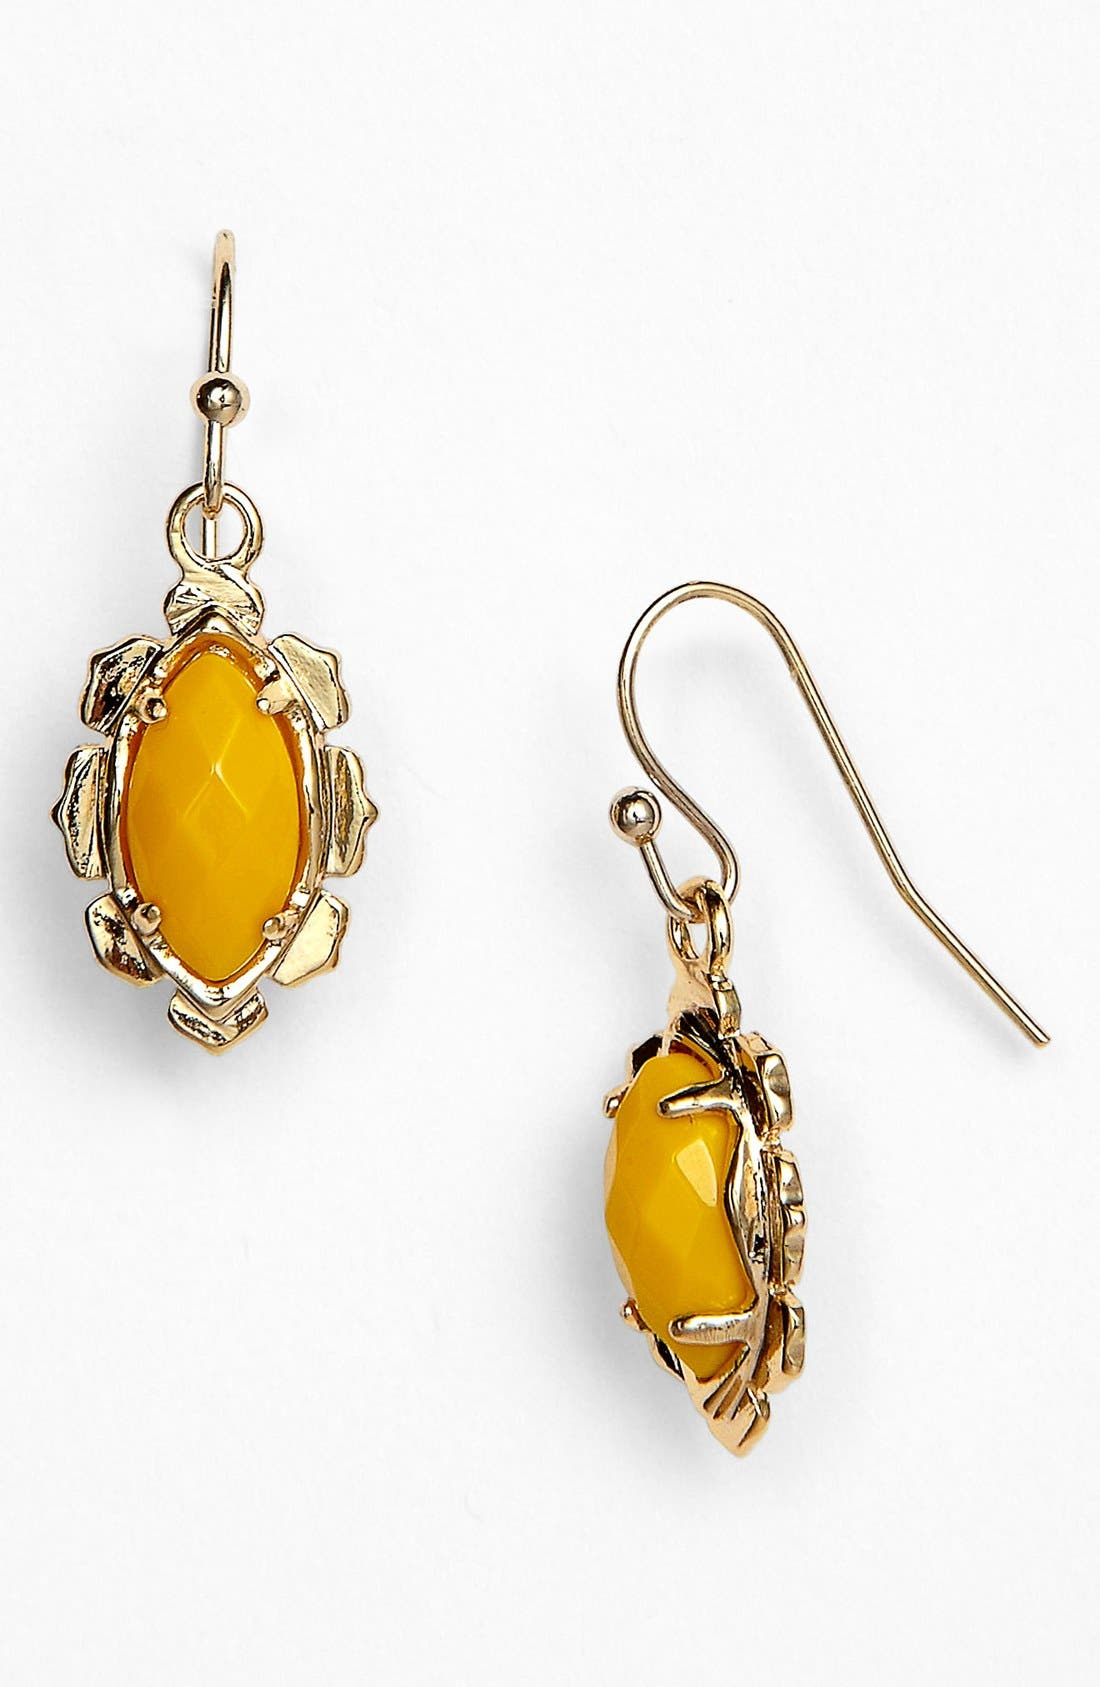 Alternate Image 1 Selected - Kendra Scott 'Zia' Drop Earrings (Nordstrom Exclusive)